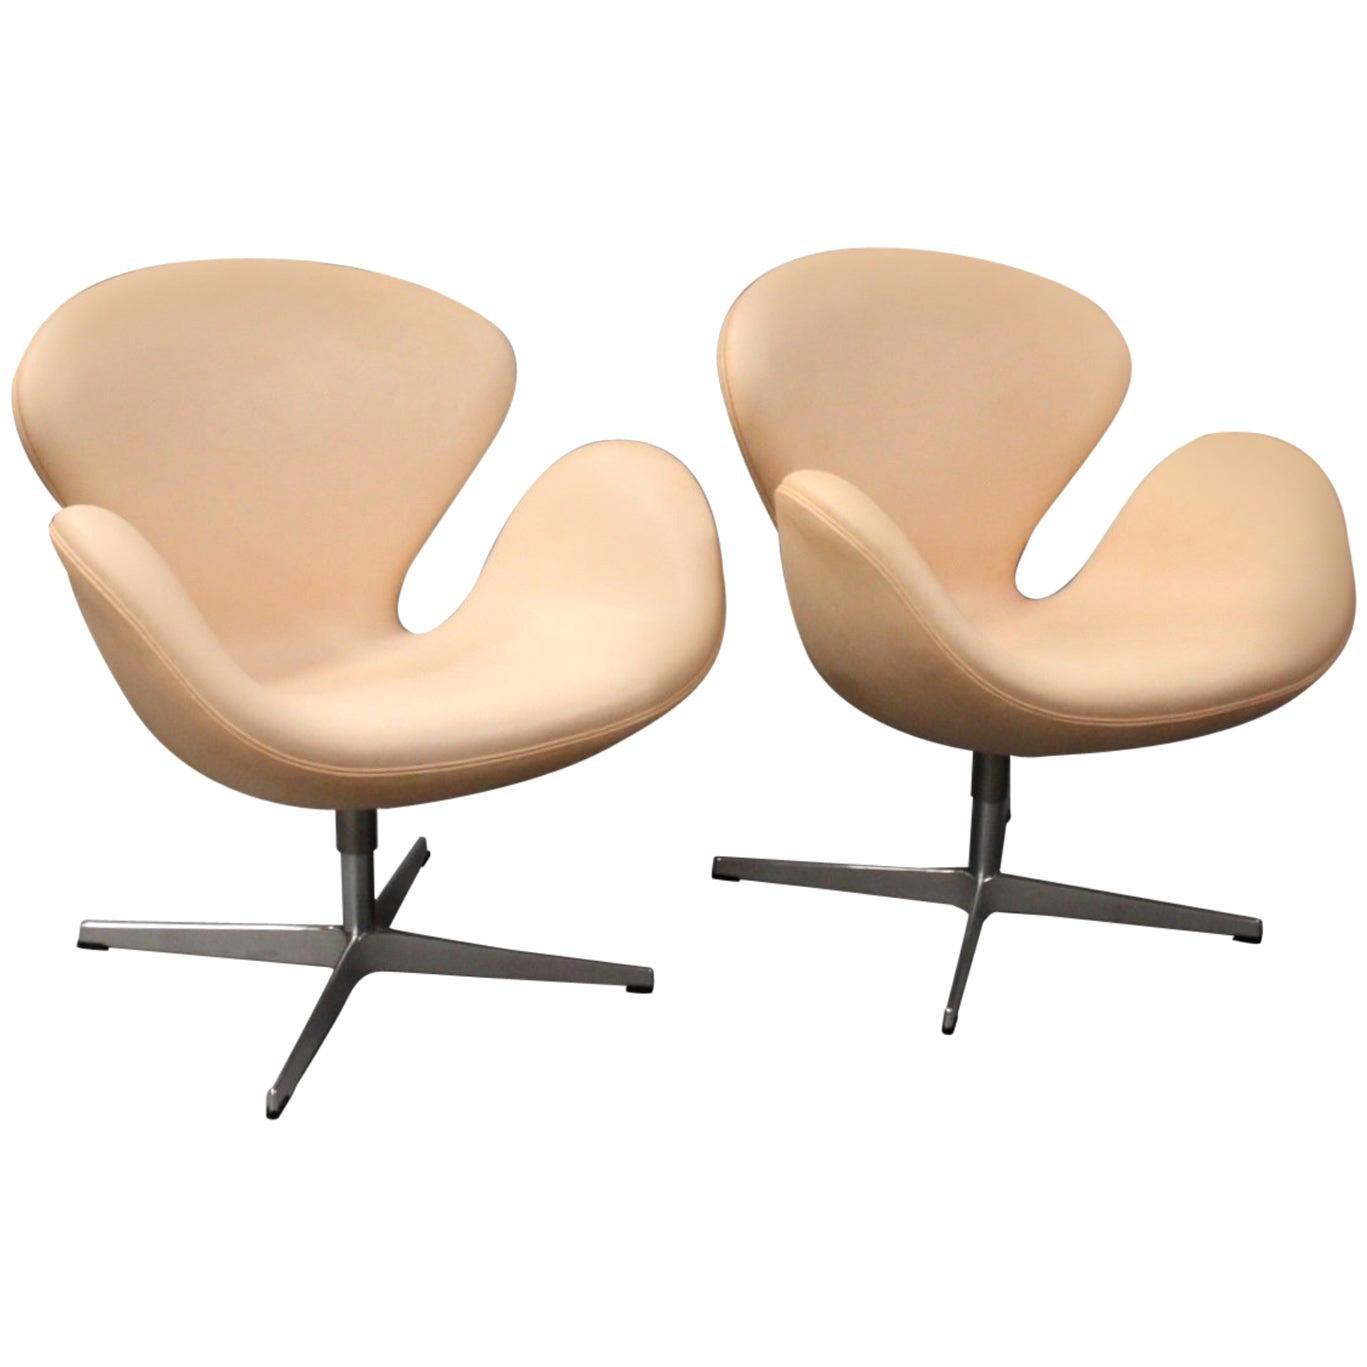 Swan Chair, Model 3320, by Arne Jacobsen and Fritz Hansen, 2013